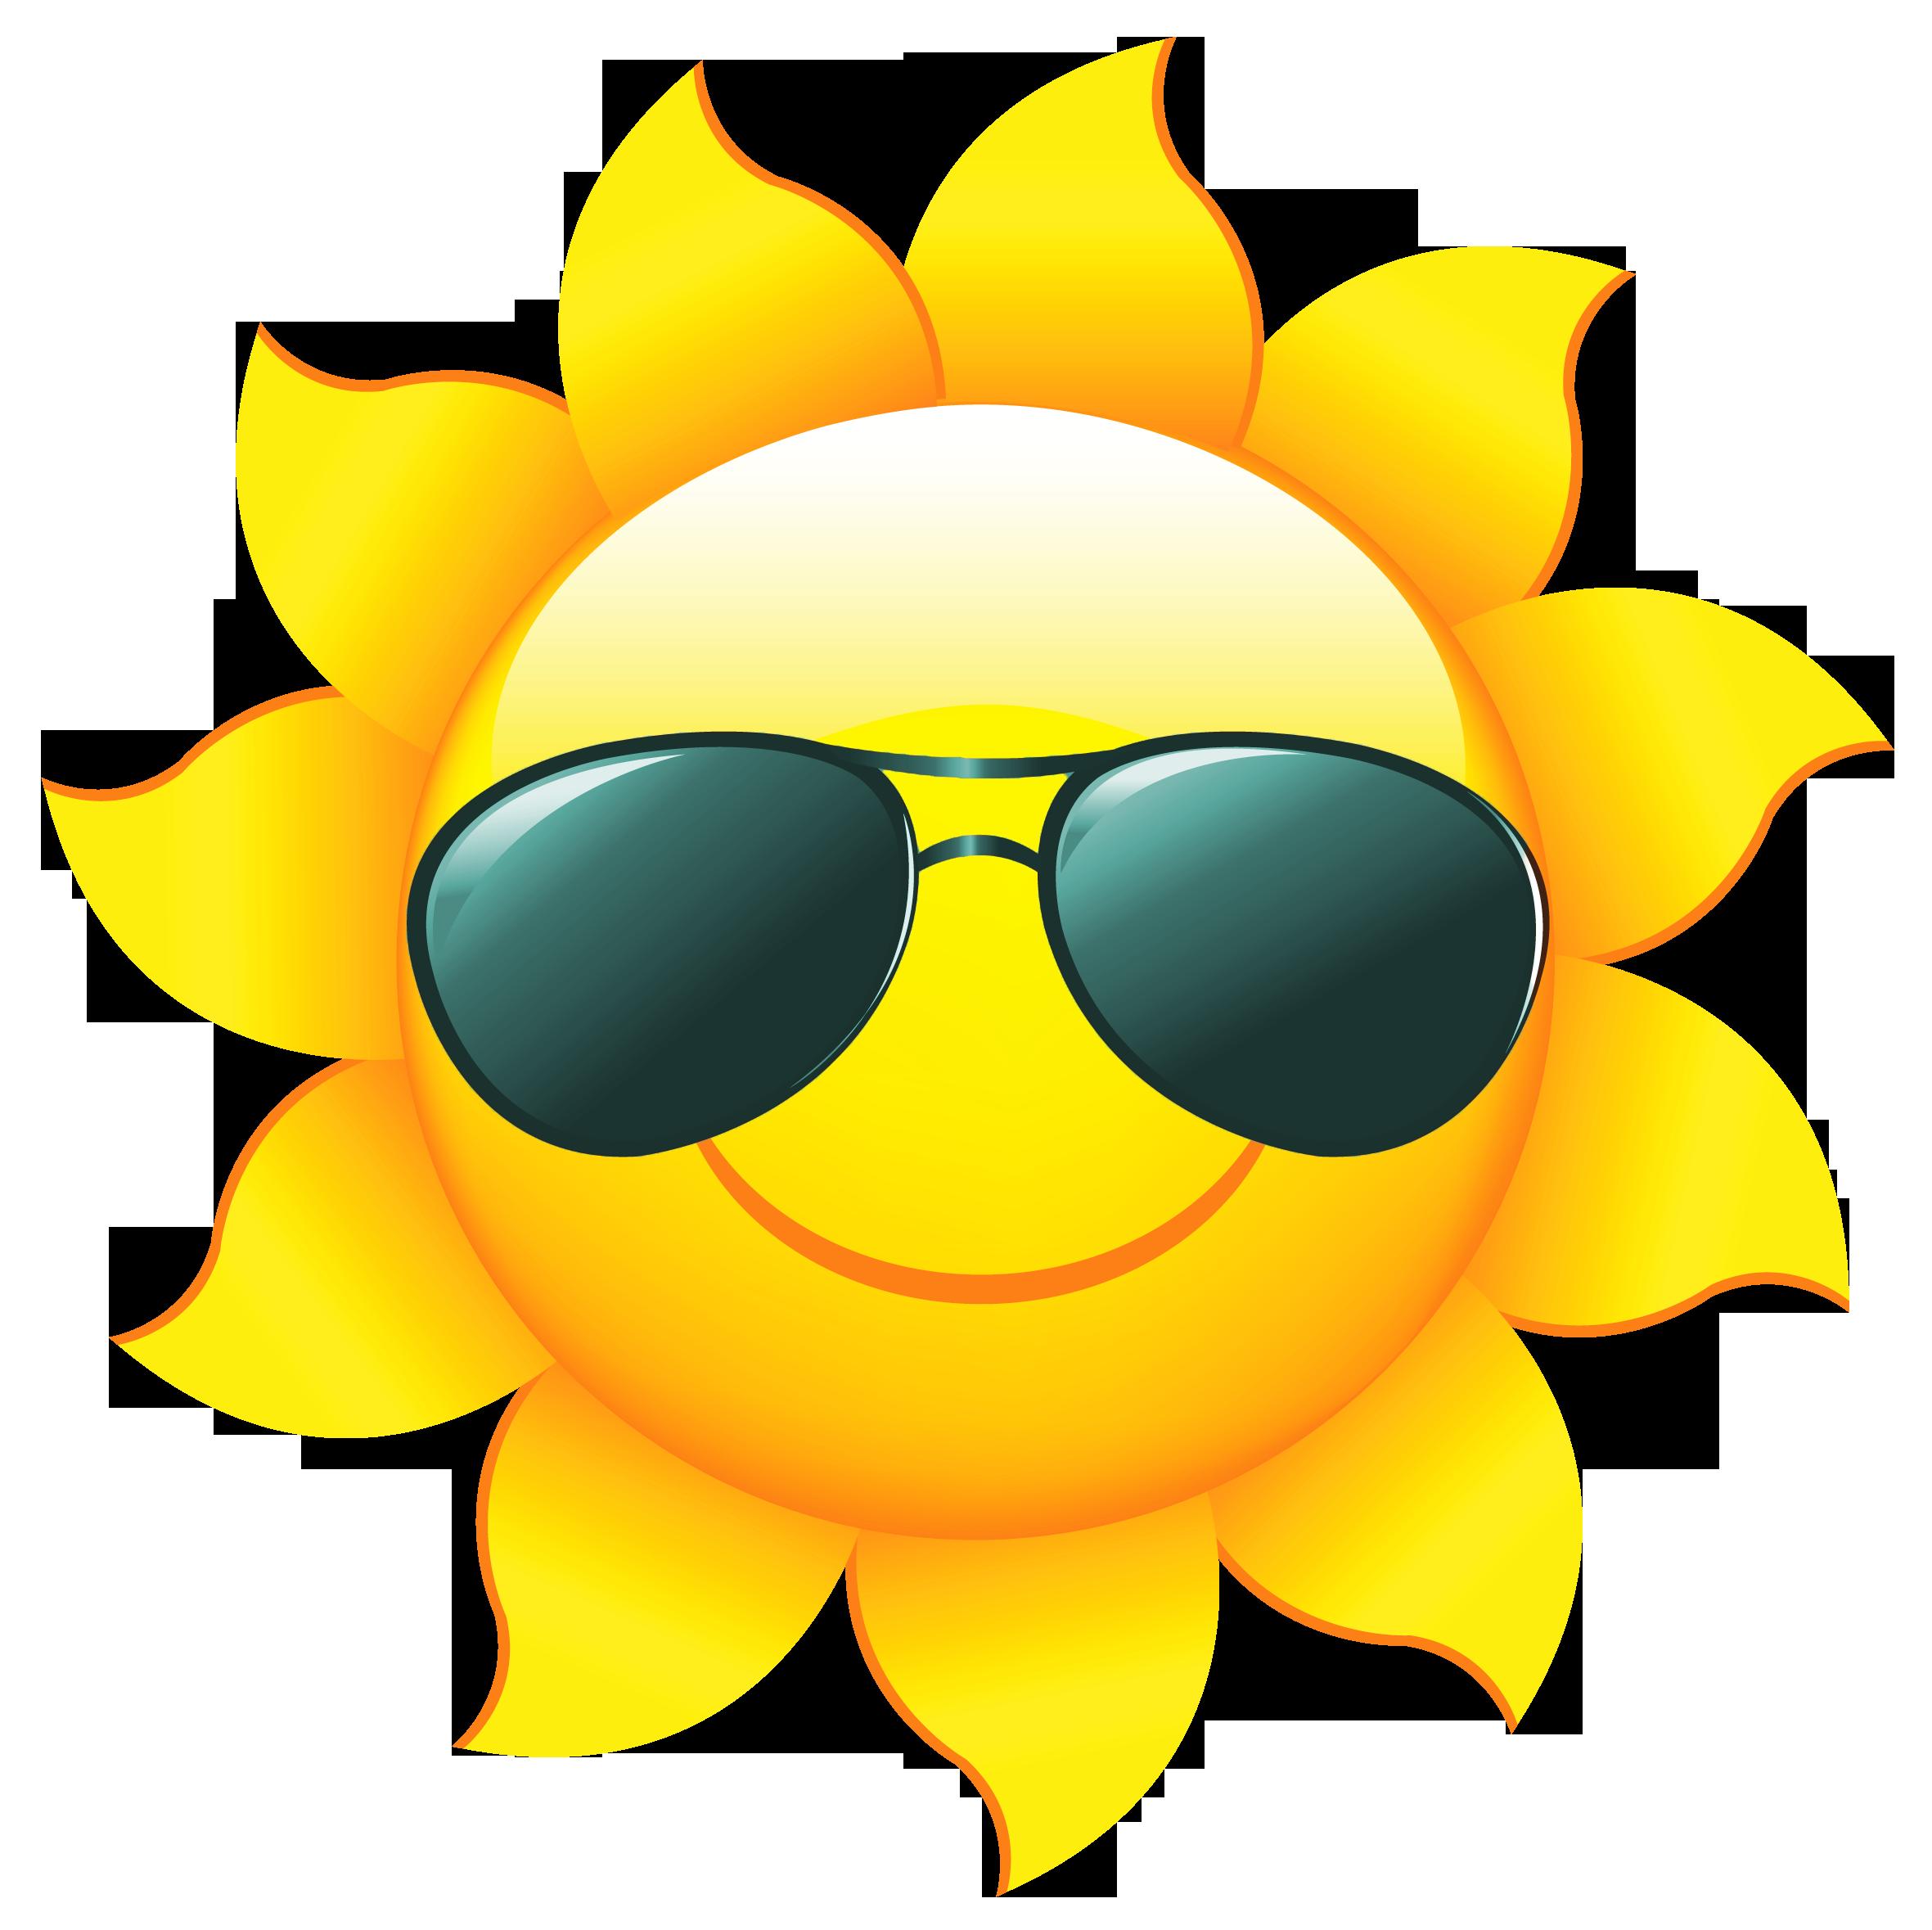 2361x2358 Sun With Shades Clipart Clipart Panda